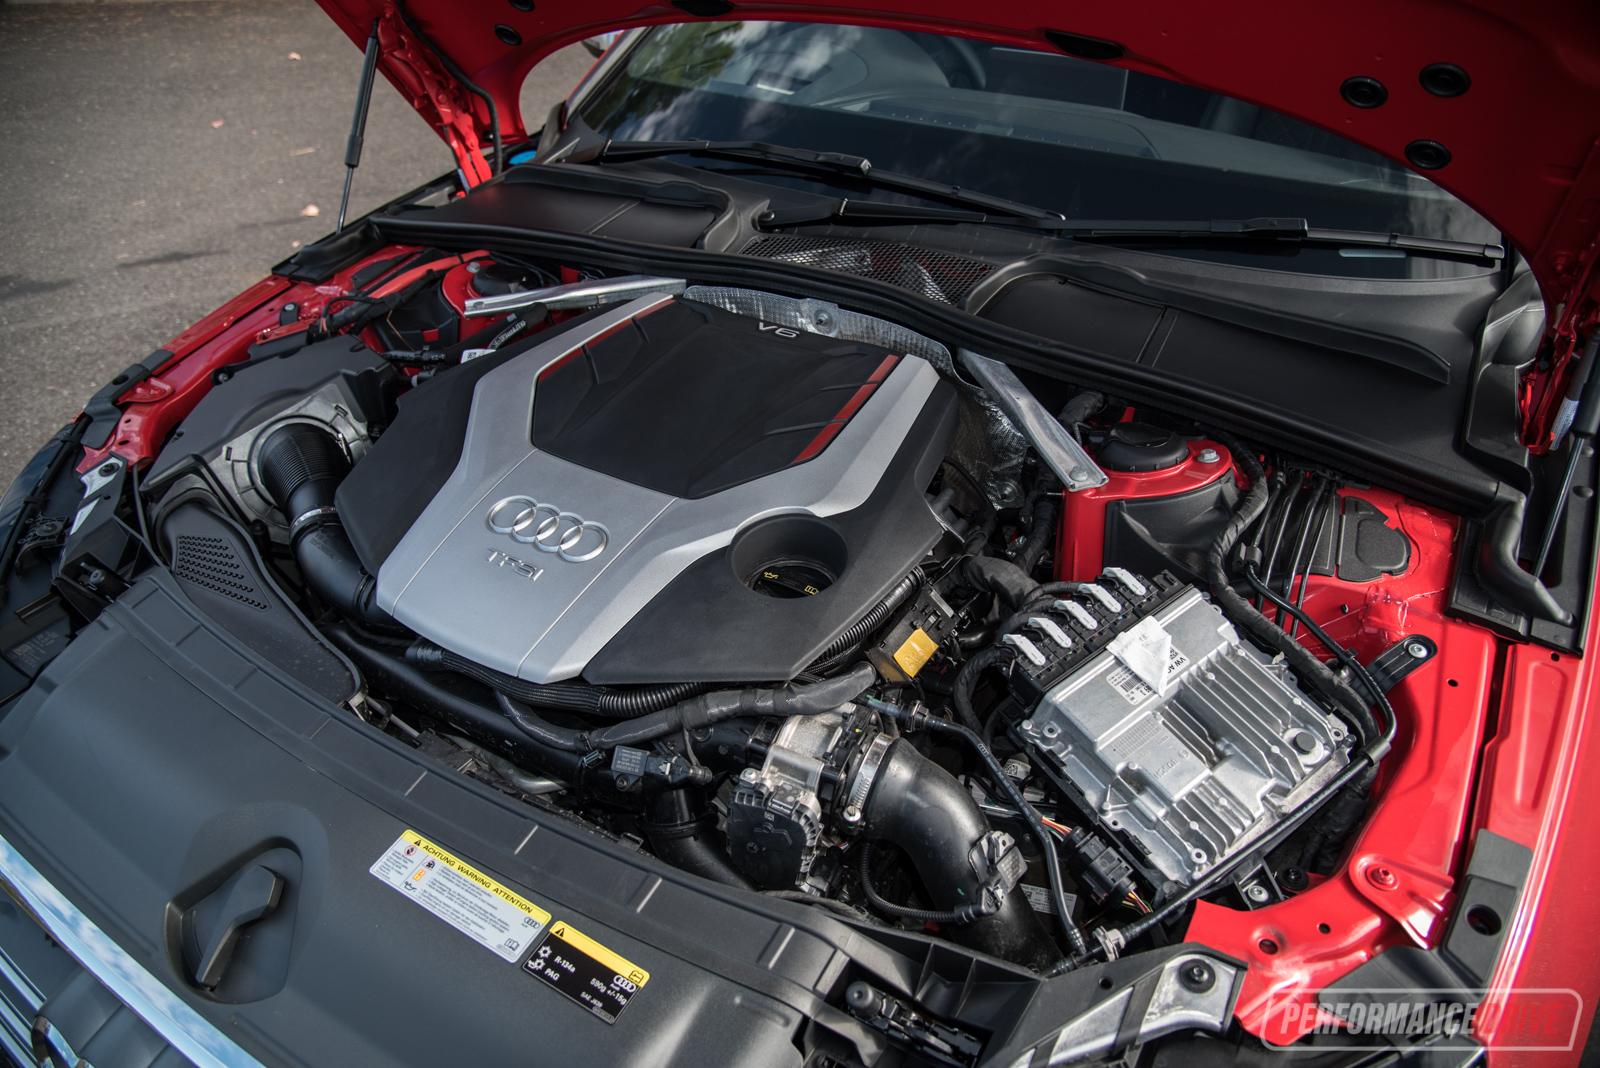 Audi S Sedan Review Video PerformanceDrive - Audi s4 horsepower